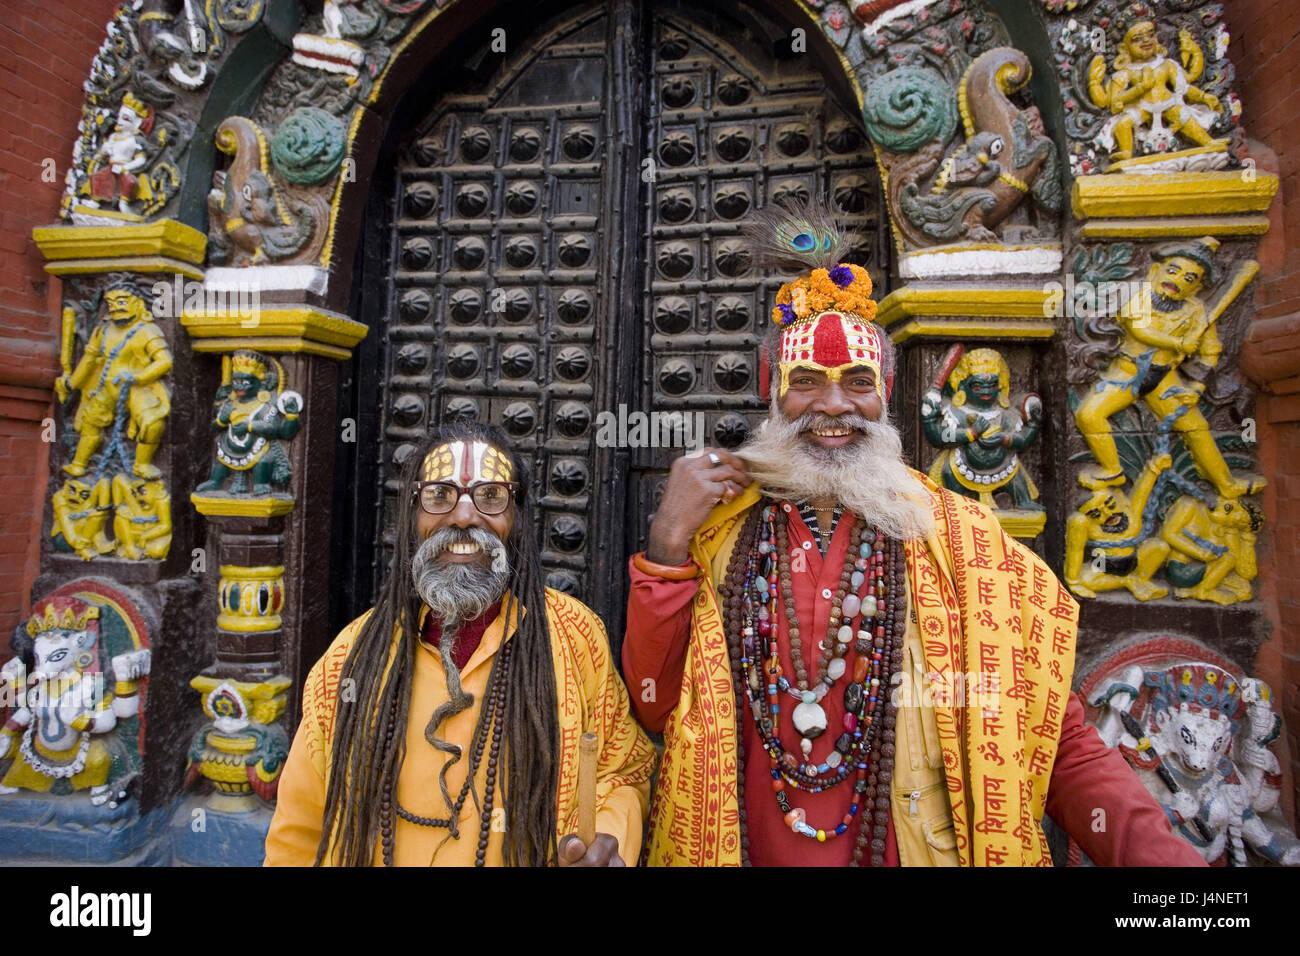 Nepal, Katmandu, Durbar Square, Sadhus, smile, portrait, - Stock Image